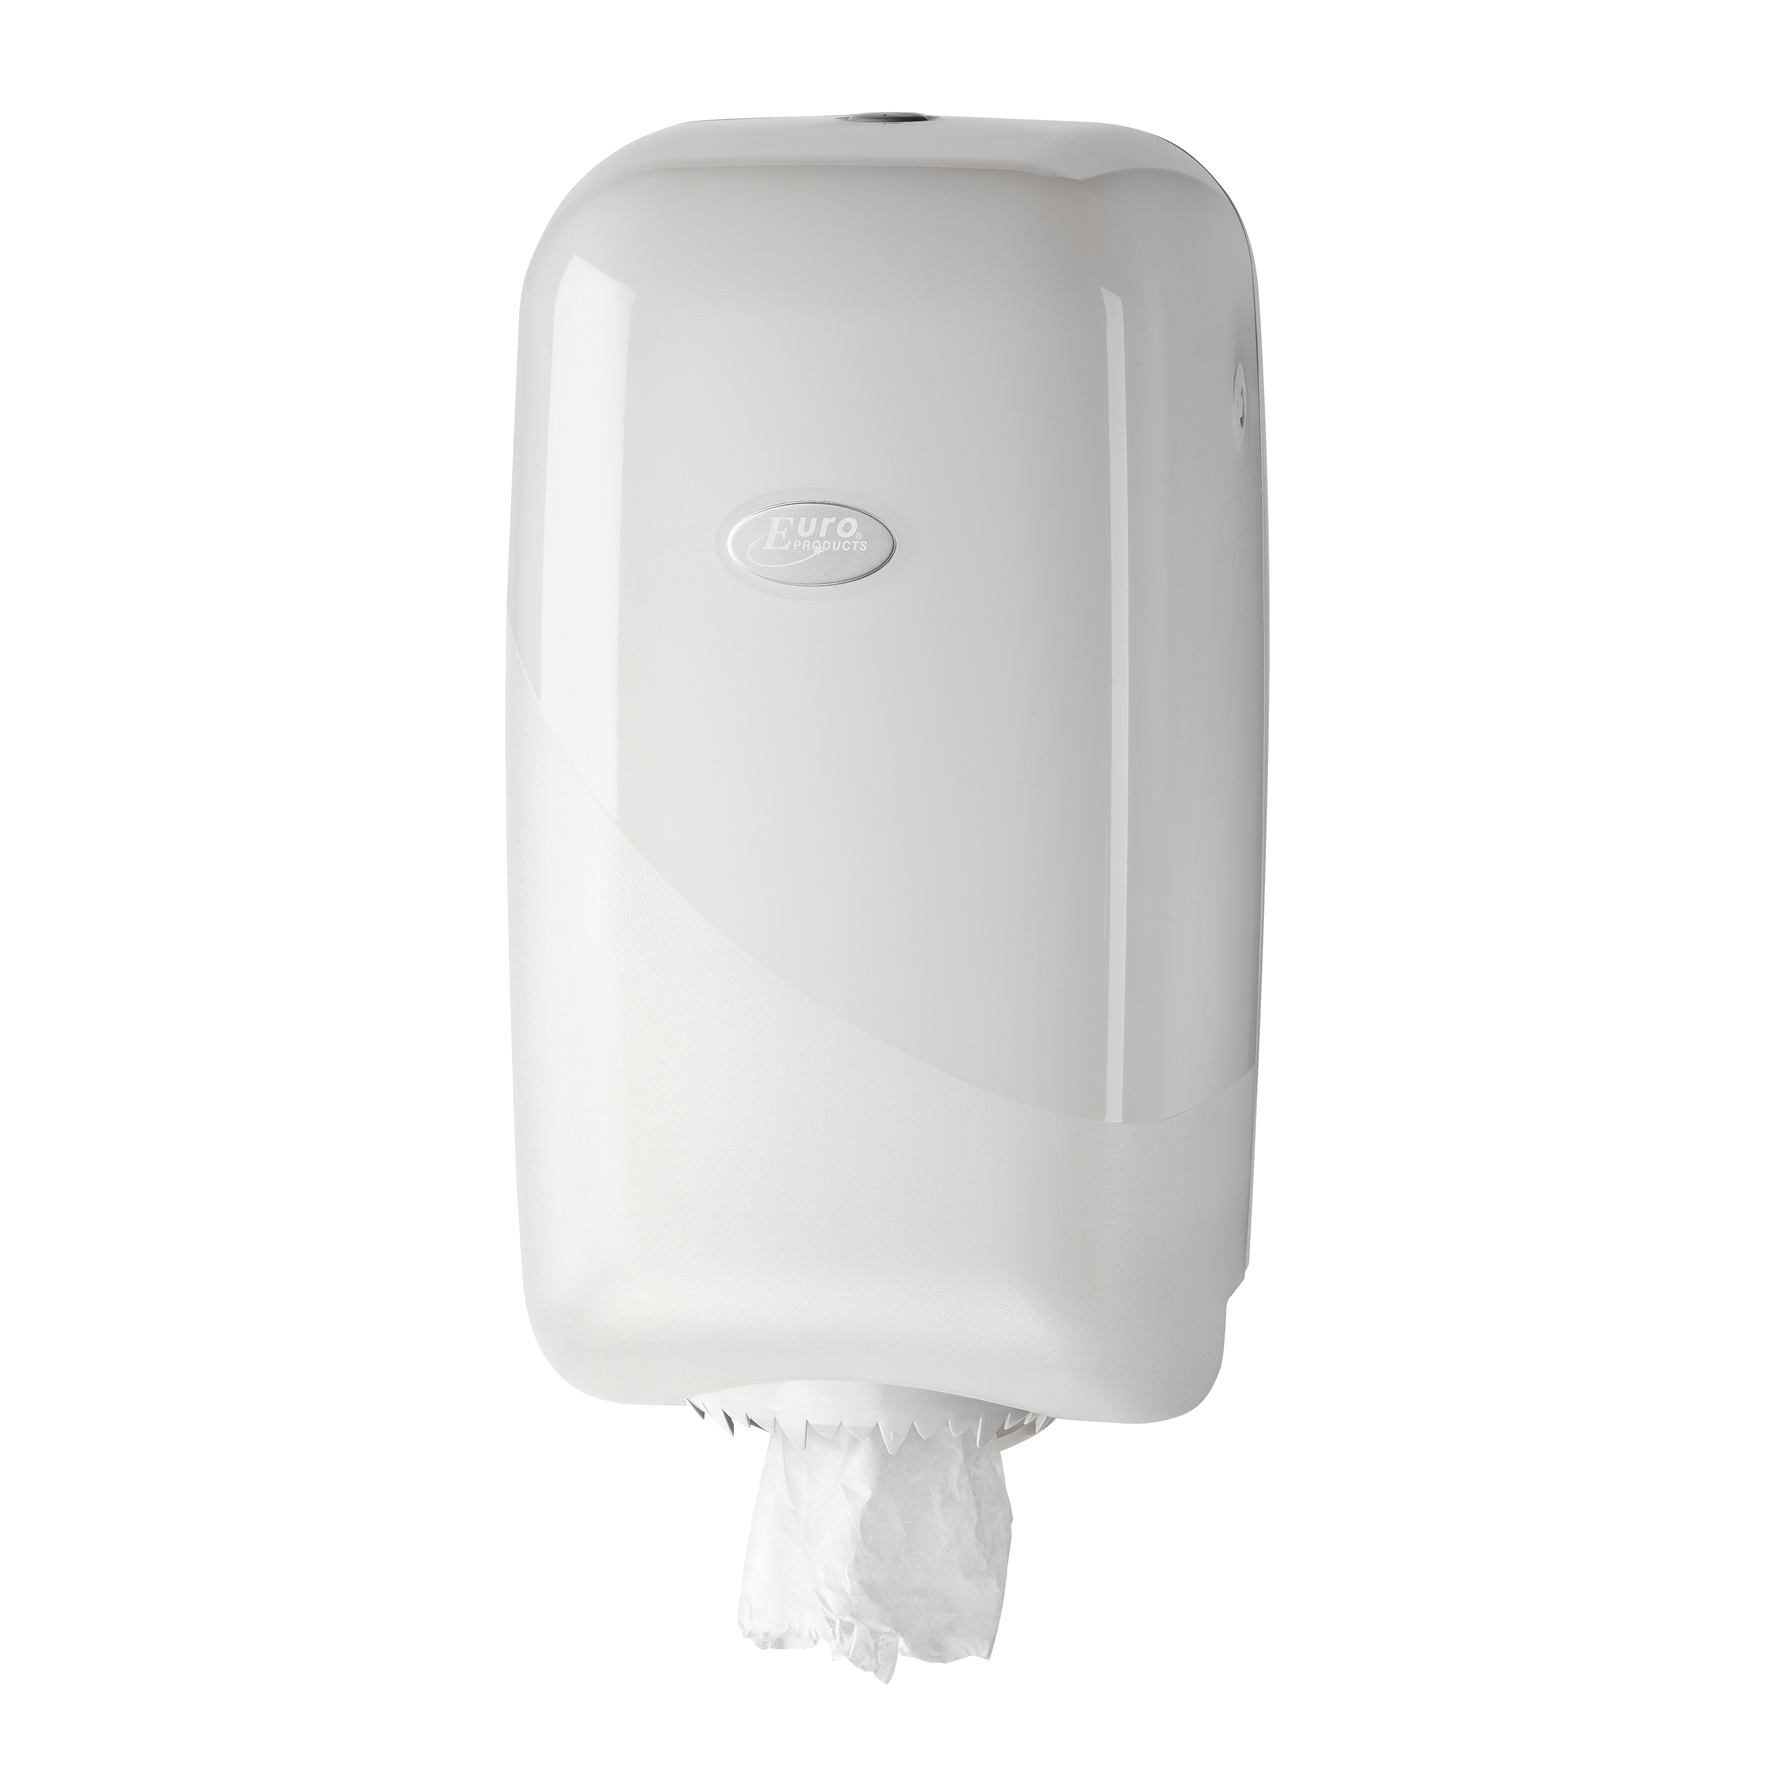 Euro Products Mini boxpapierdispenser Pearl white, wit kunststof